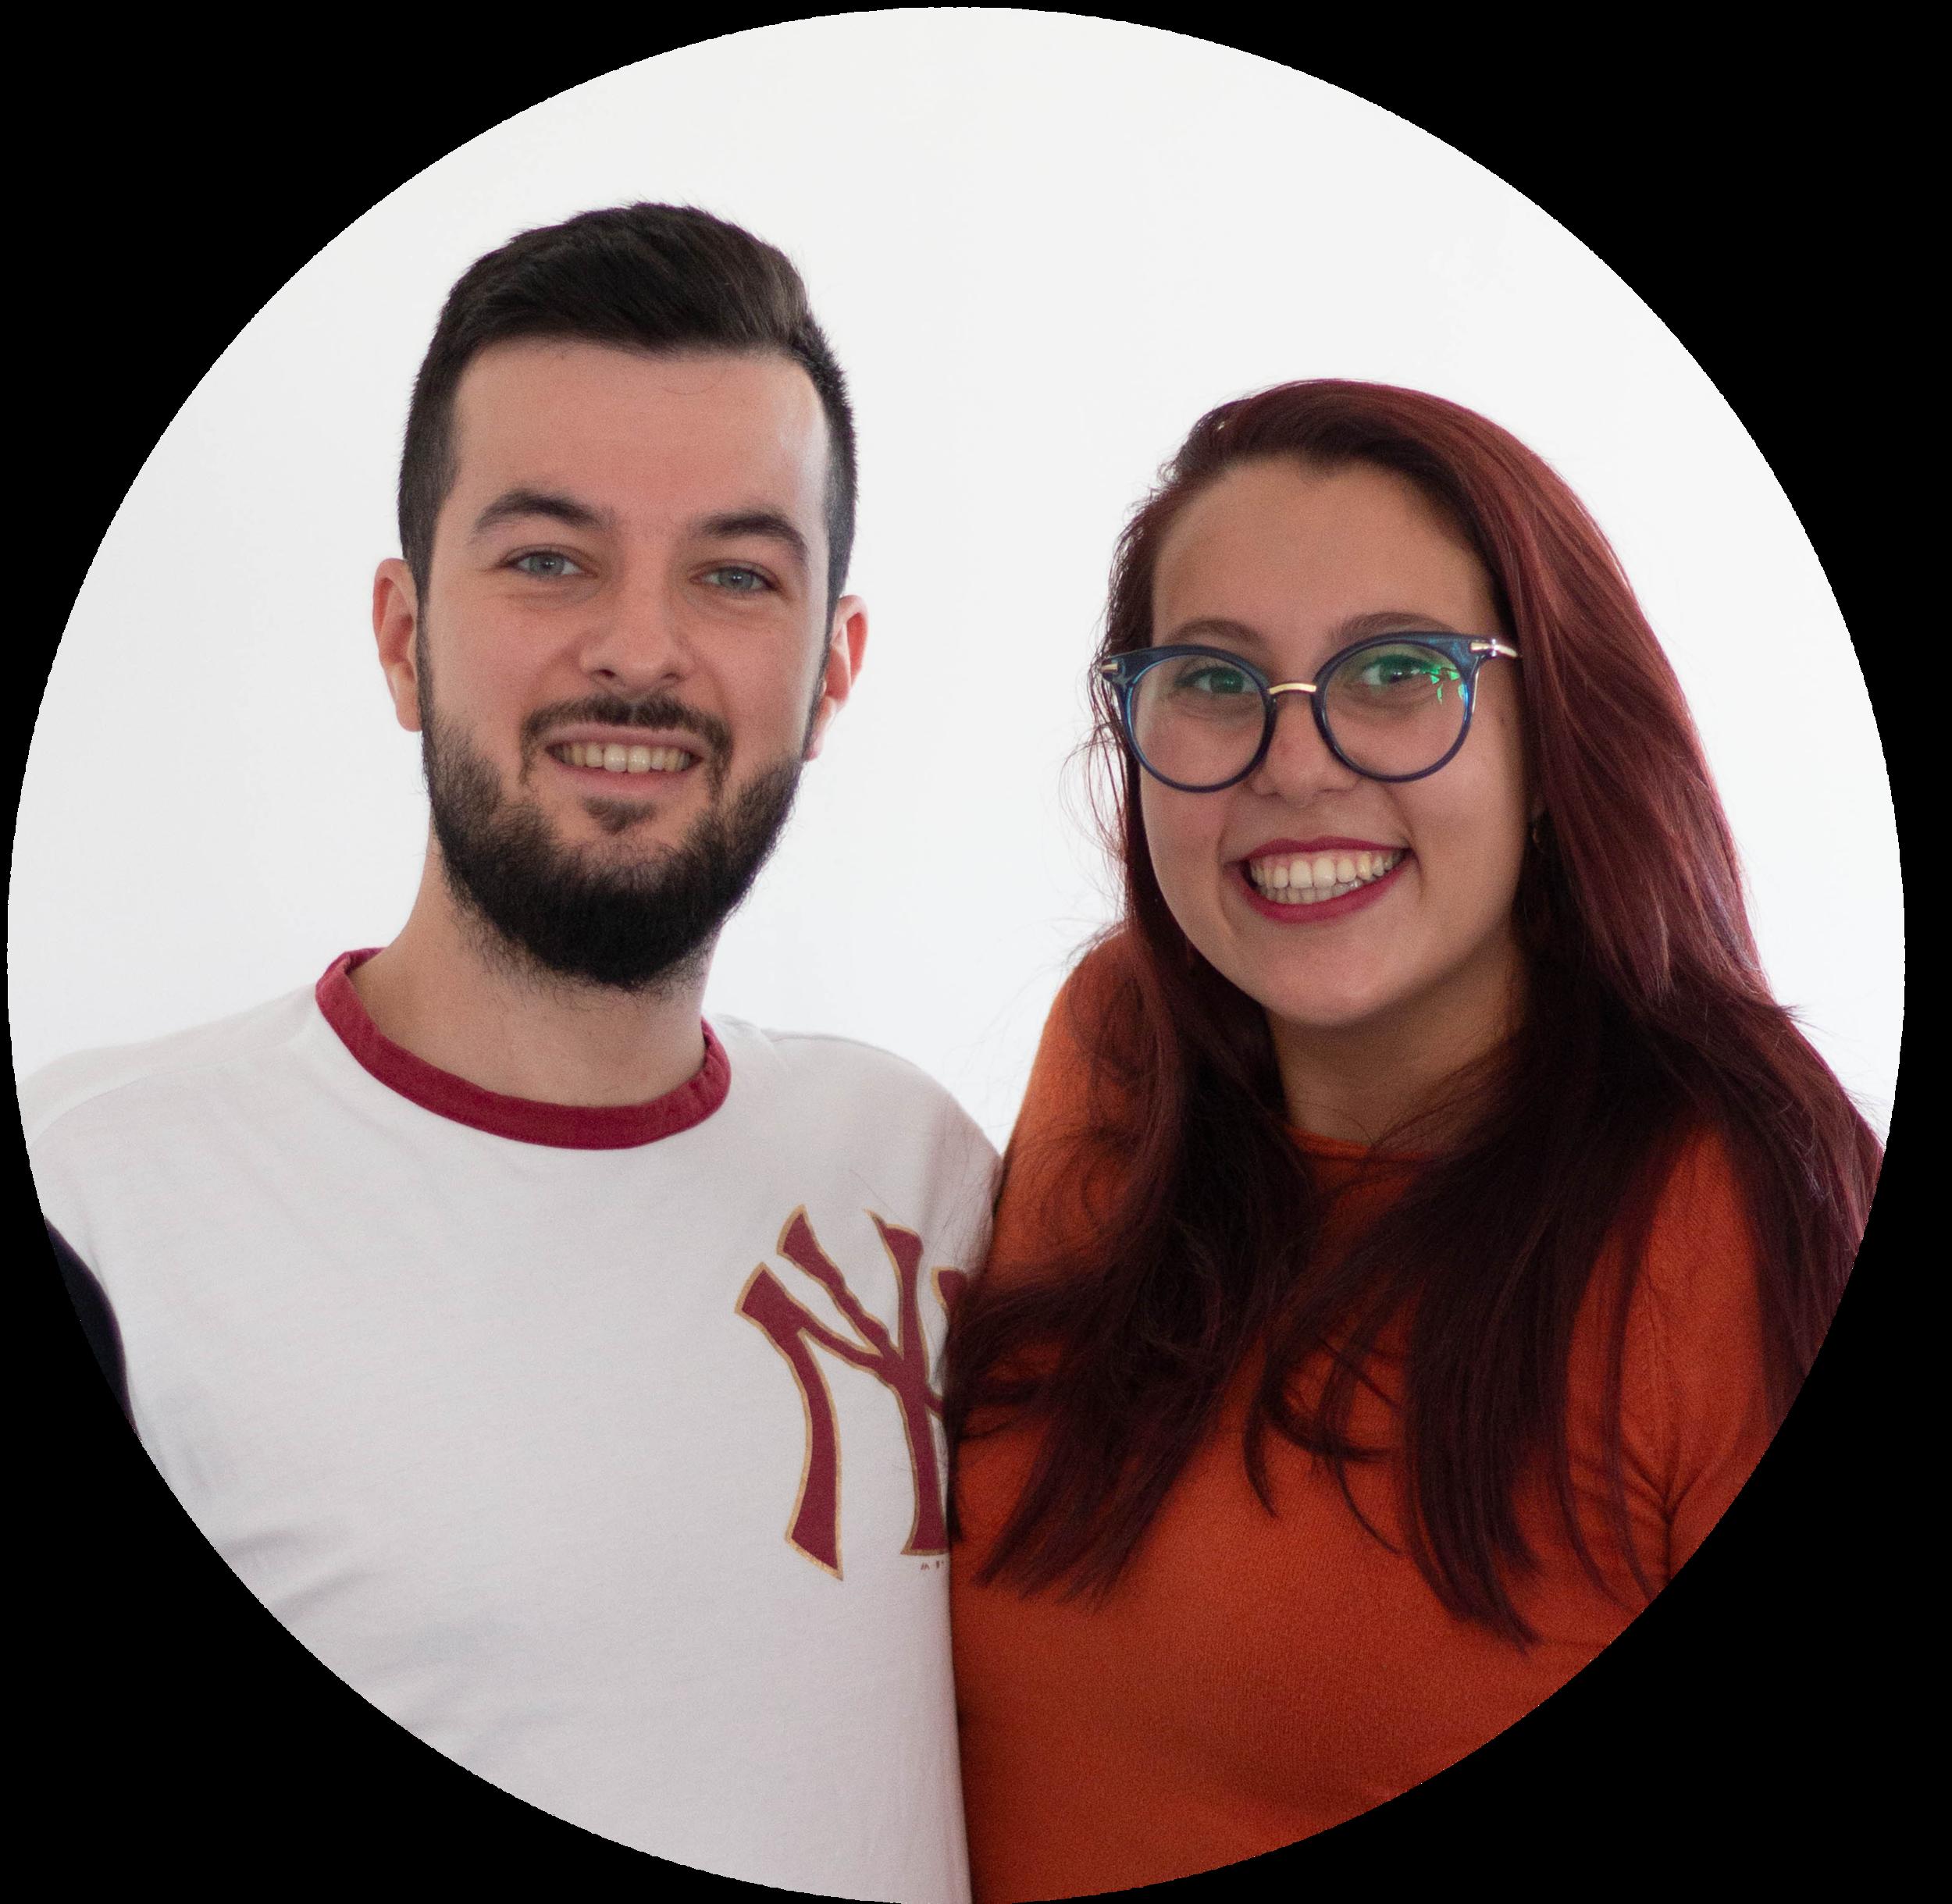 George e Alessandra - RESPONSABILE GRUPPO GIOVANI